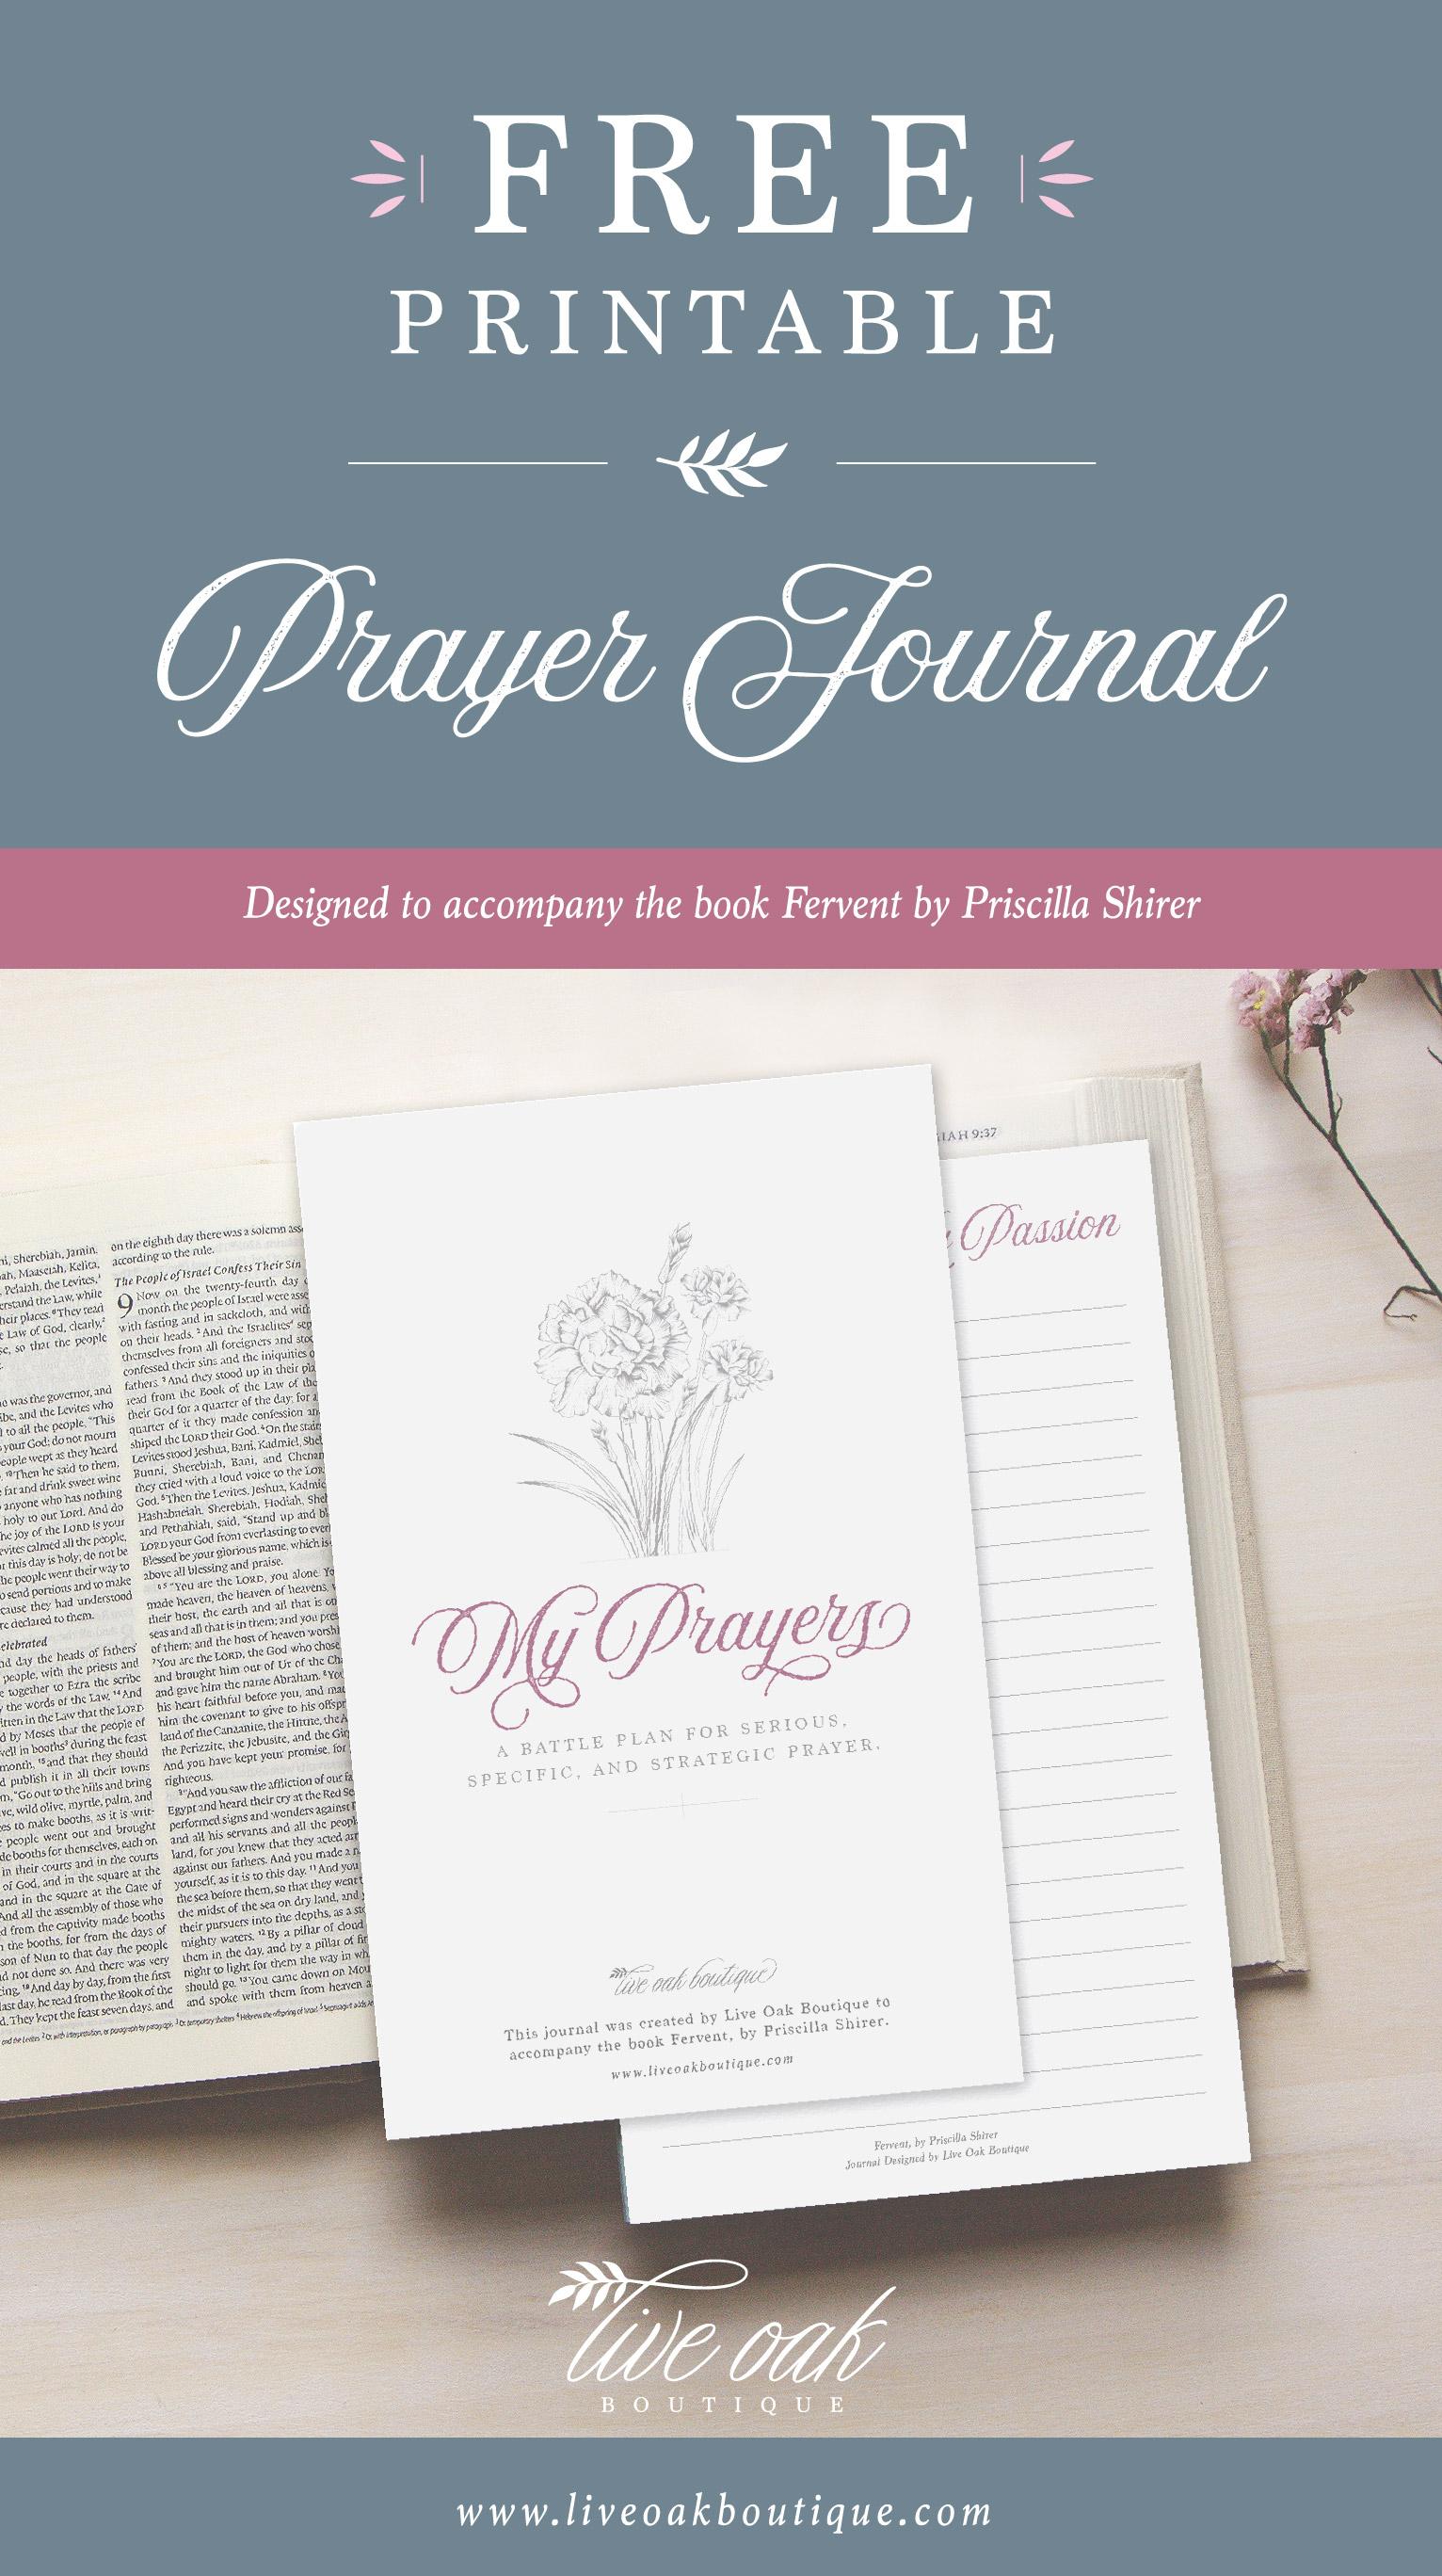 Free Prayer Journal Printable from Live Oak Boutique. www.liveoakboutique.com